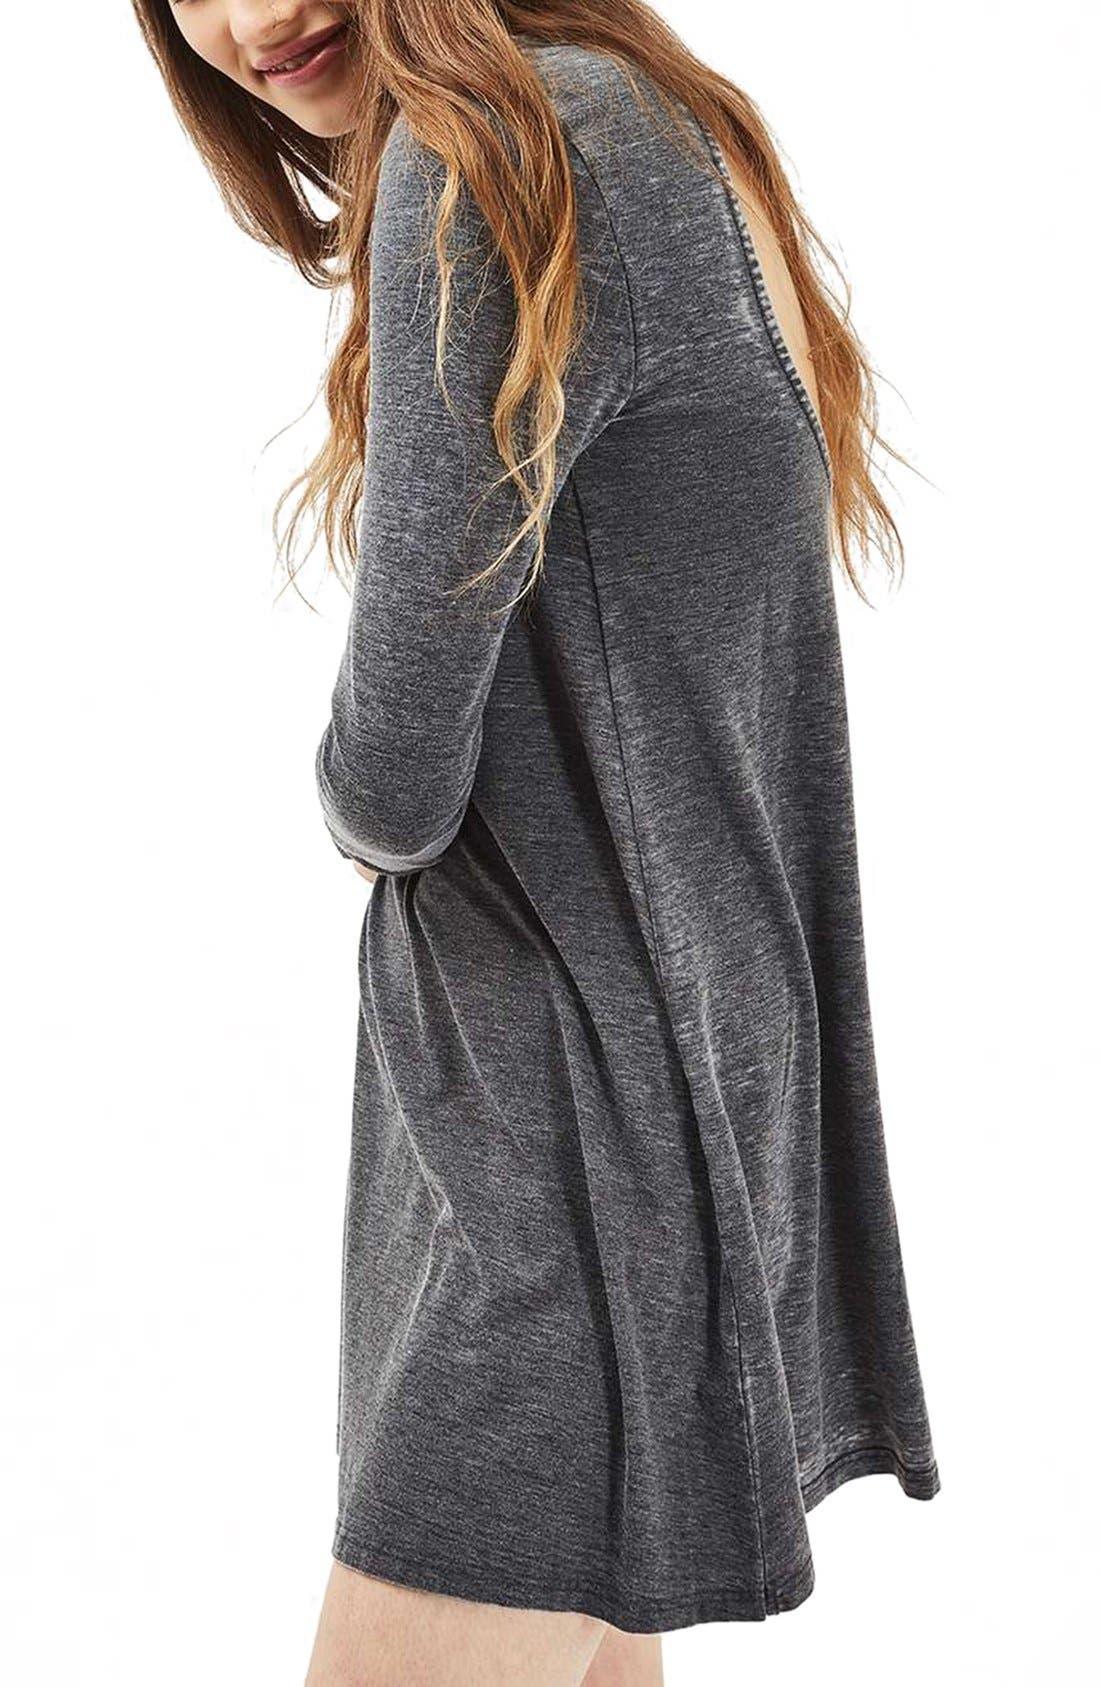 Alternate Image 1 Selected - Topshop Open Back Tunic Dress